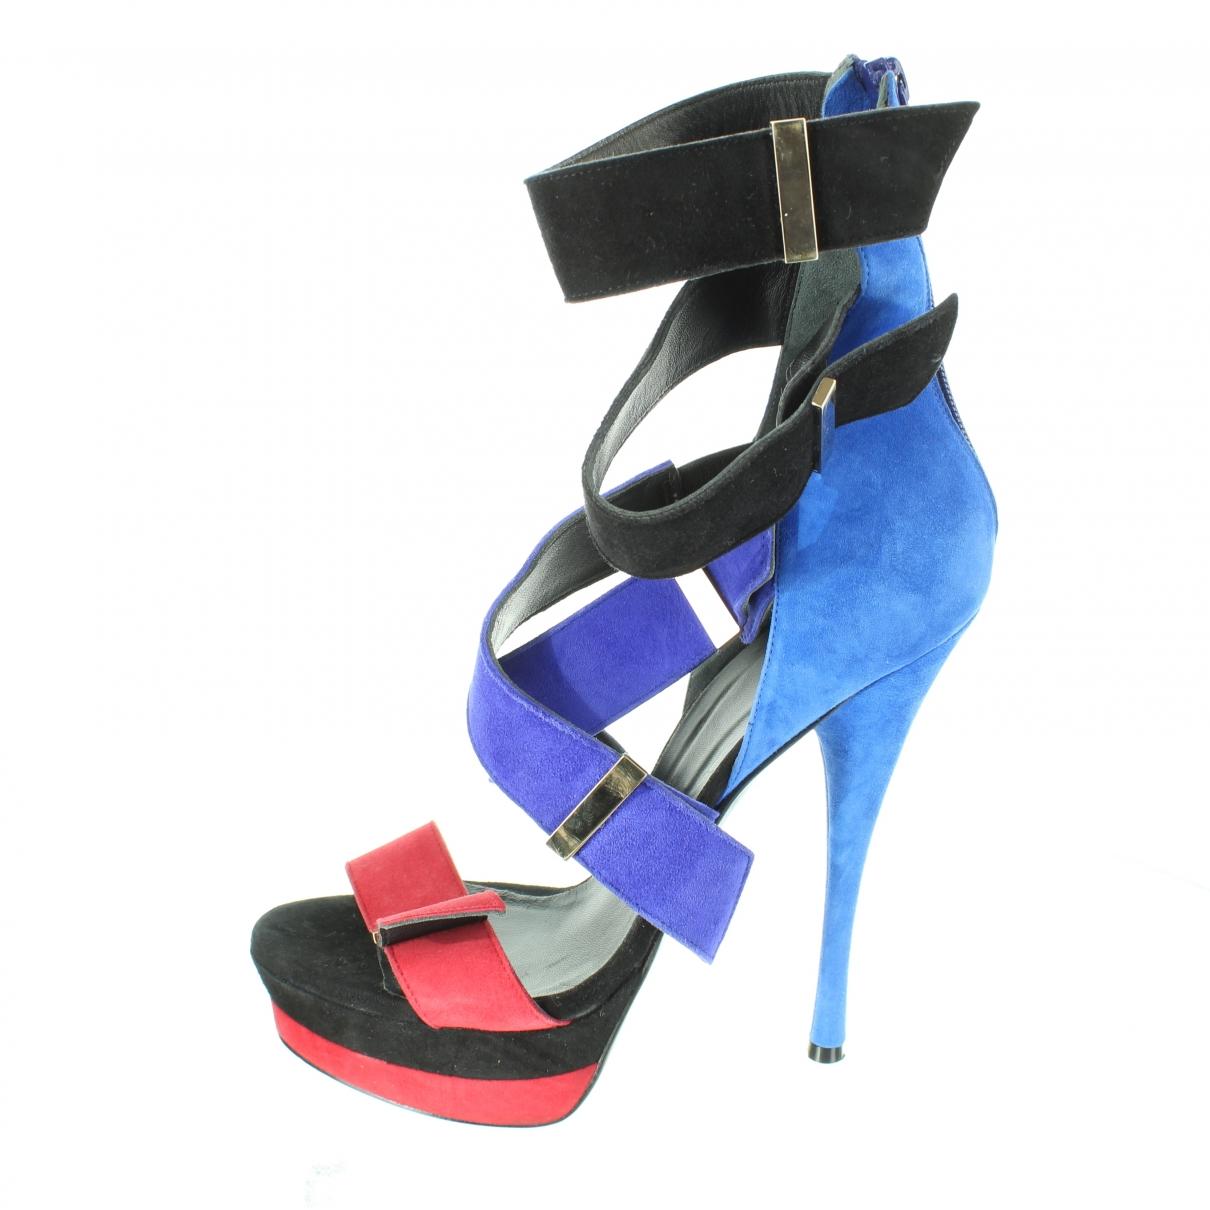 Versace - Escarpins   pour femme en suede - multicolore